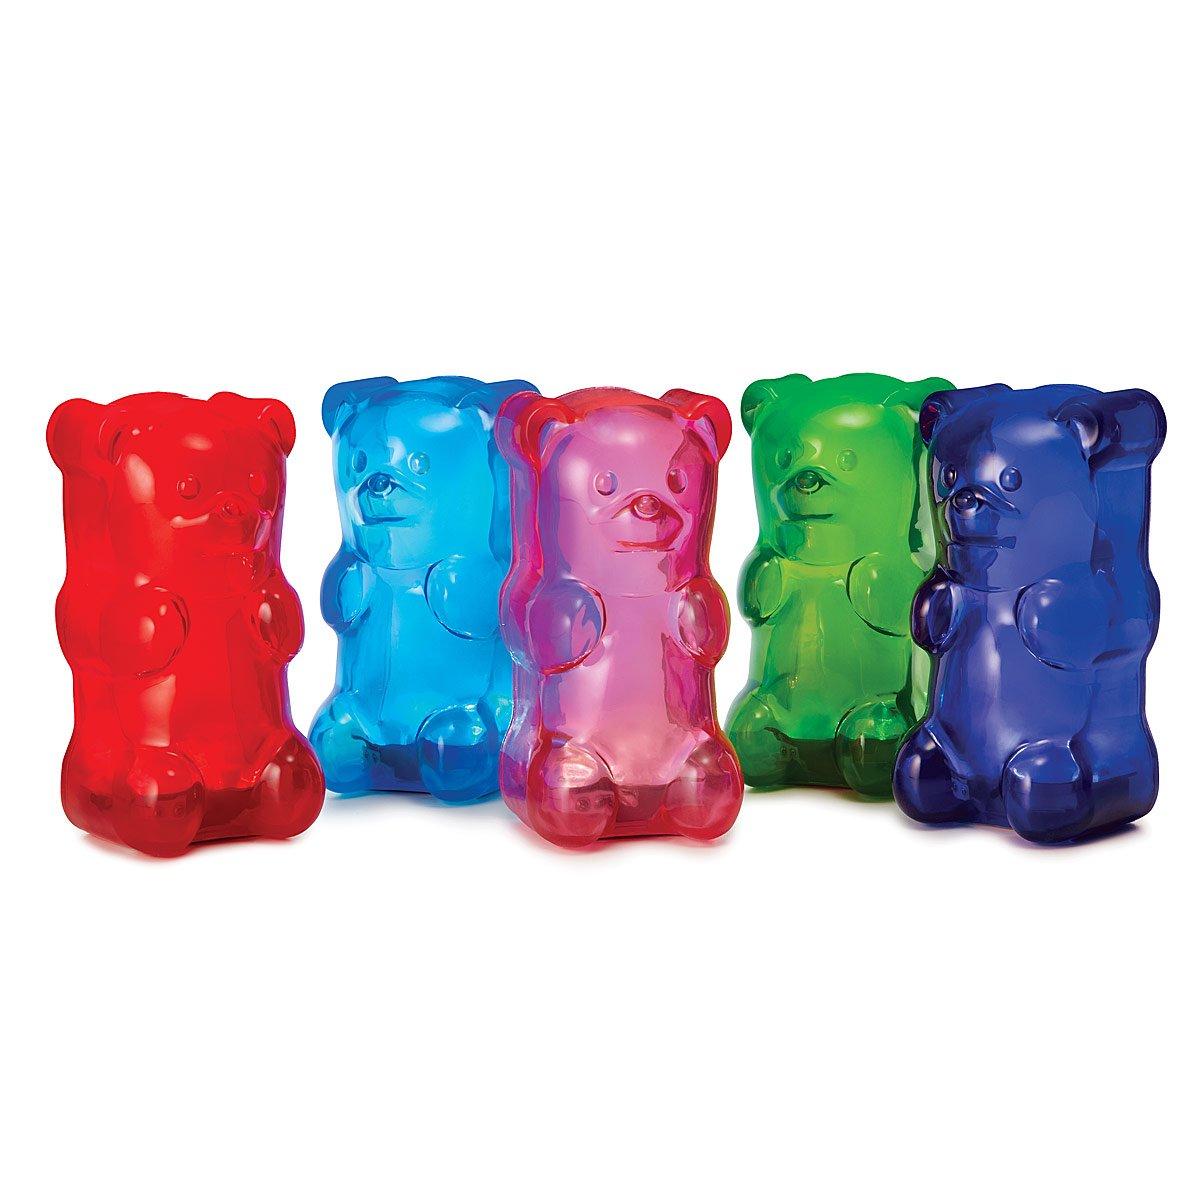 Squishy Gummy Bear Light Gummi Bear Lamp Nightlight Uncommon Goods